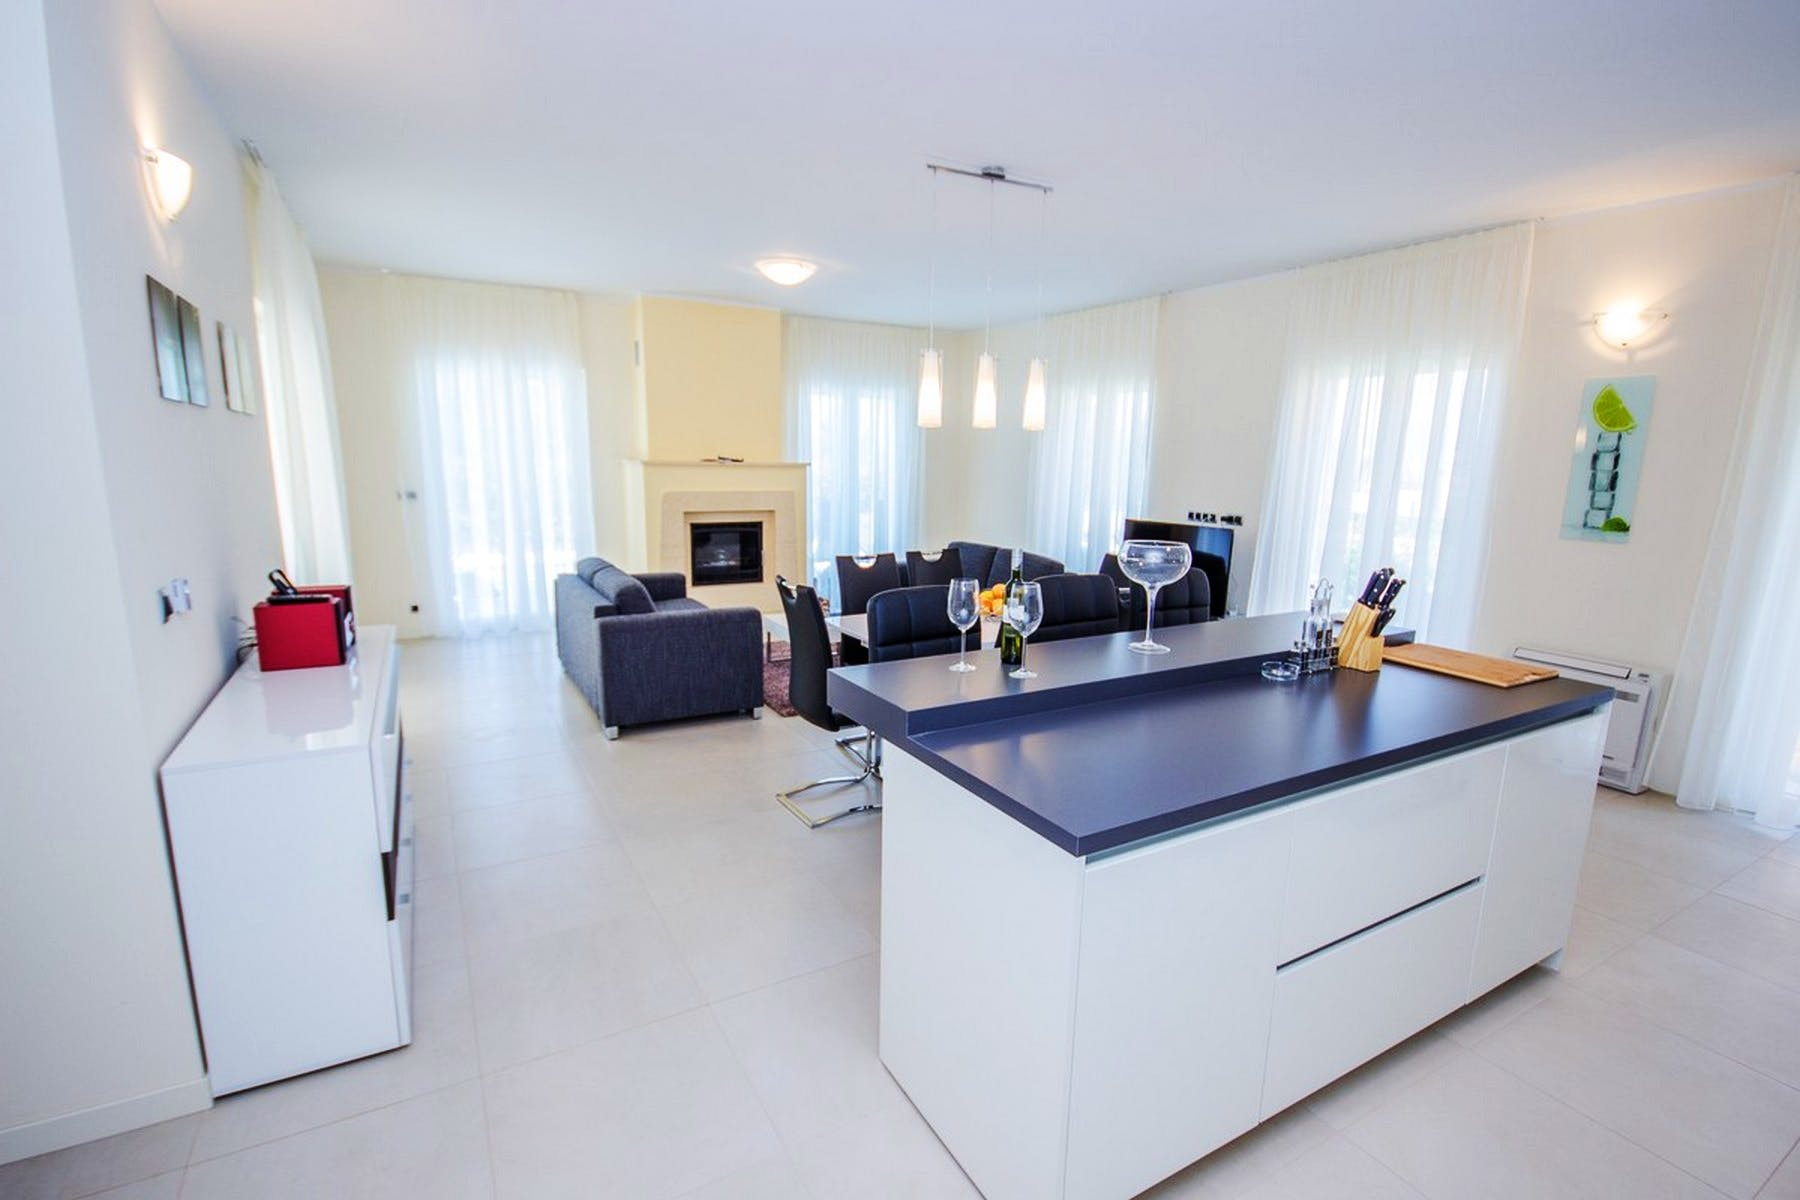 Modernly furnished living area